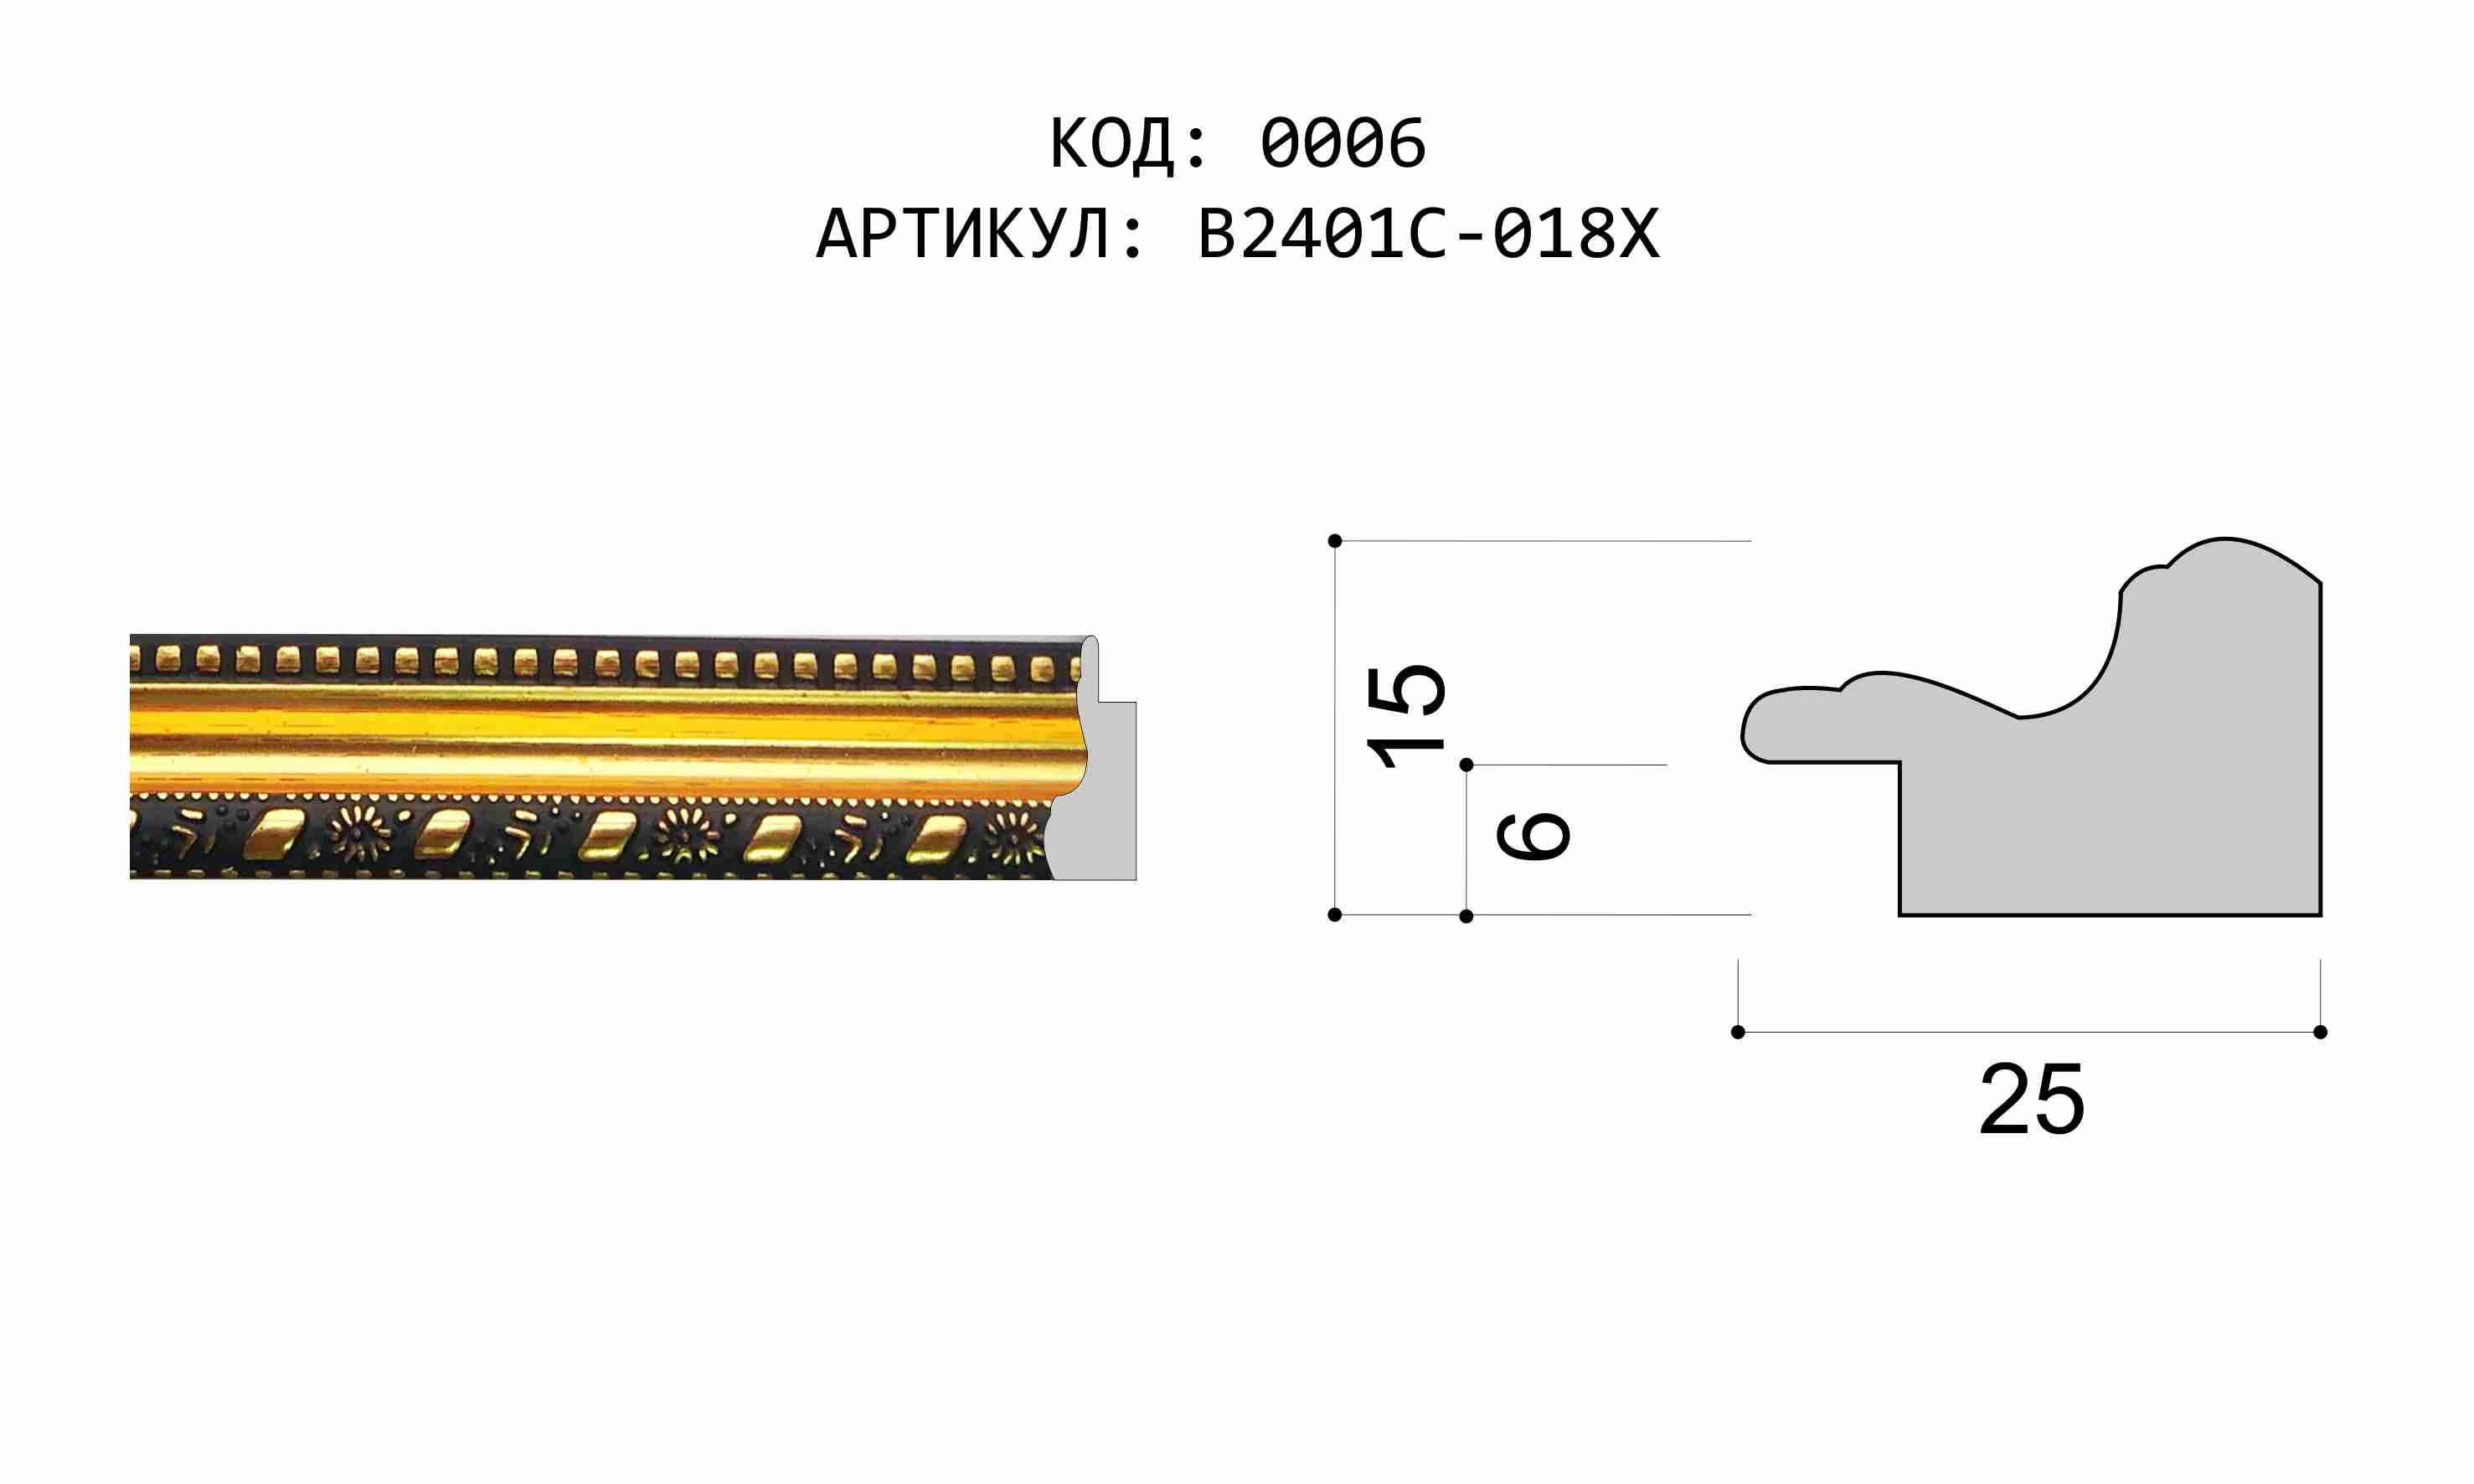 Артикул: B2401C-018X